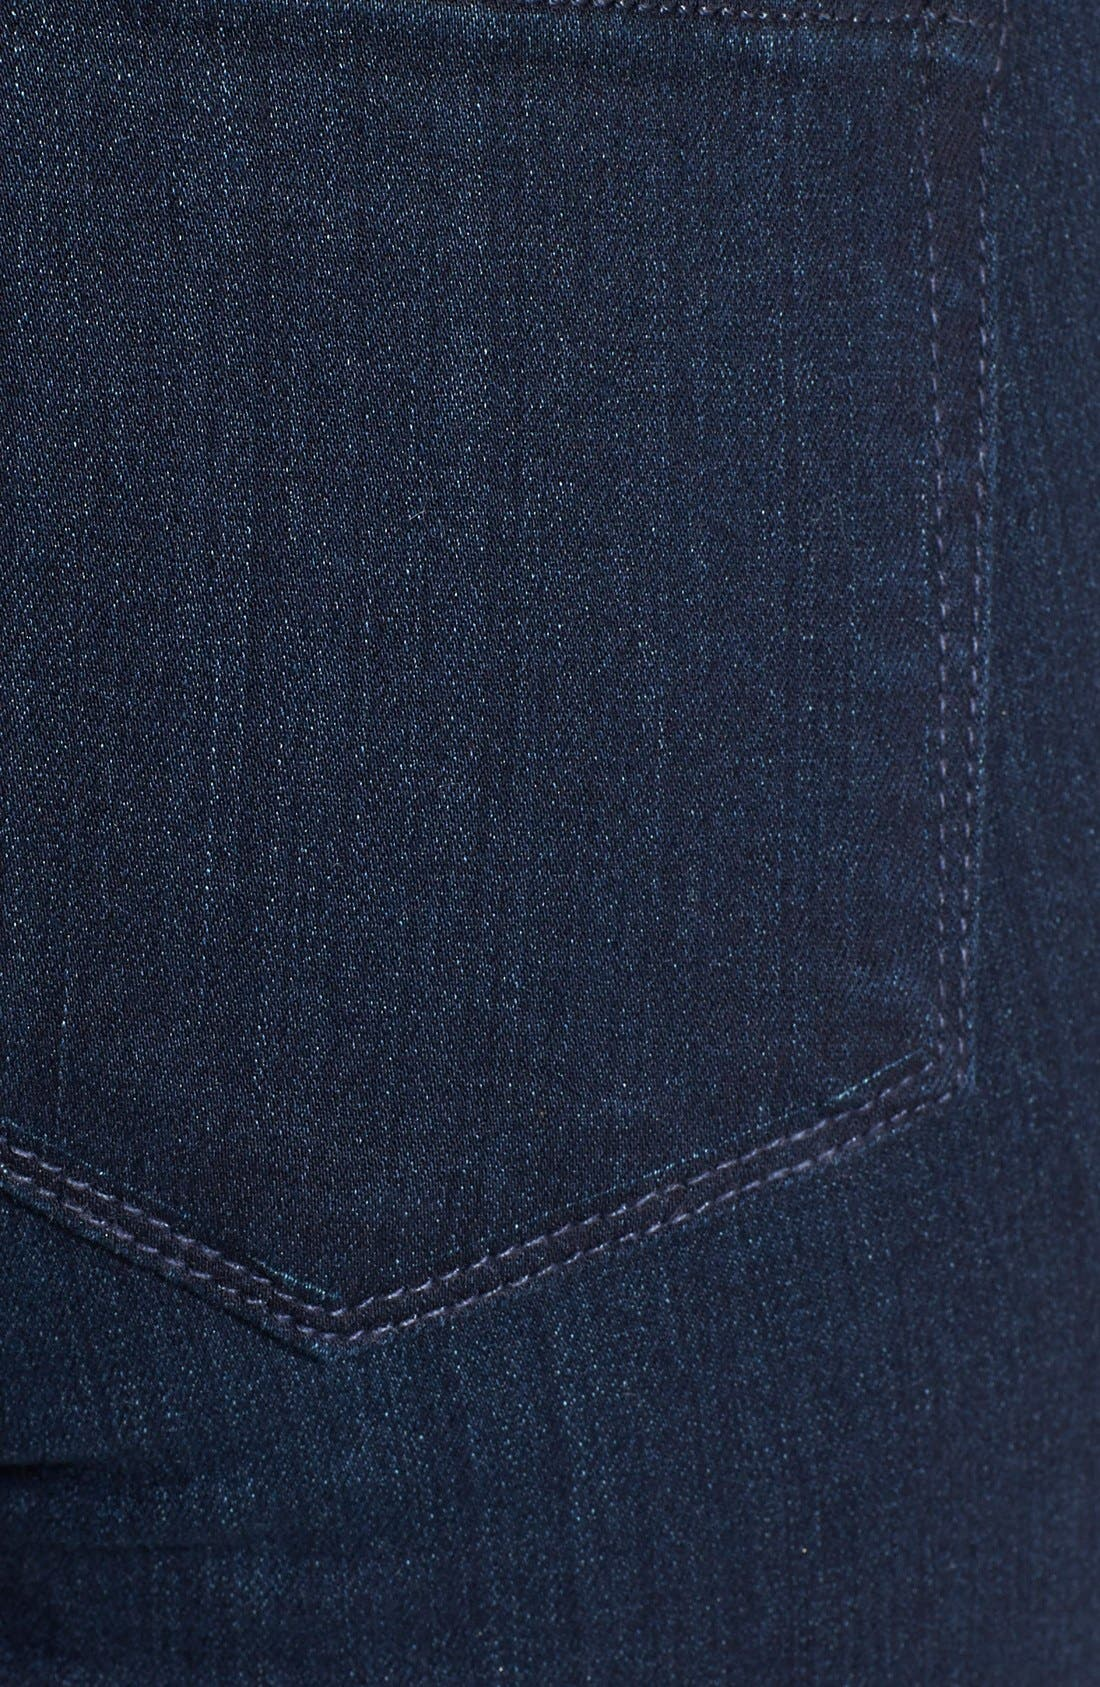 Alternate Image 3  - PAIGE 'Transcend - Verdugo' Ankle Jeans (Mae)